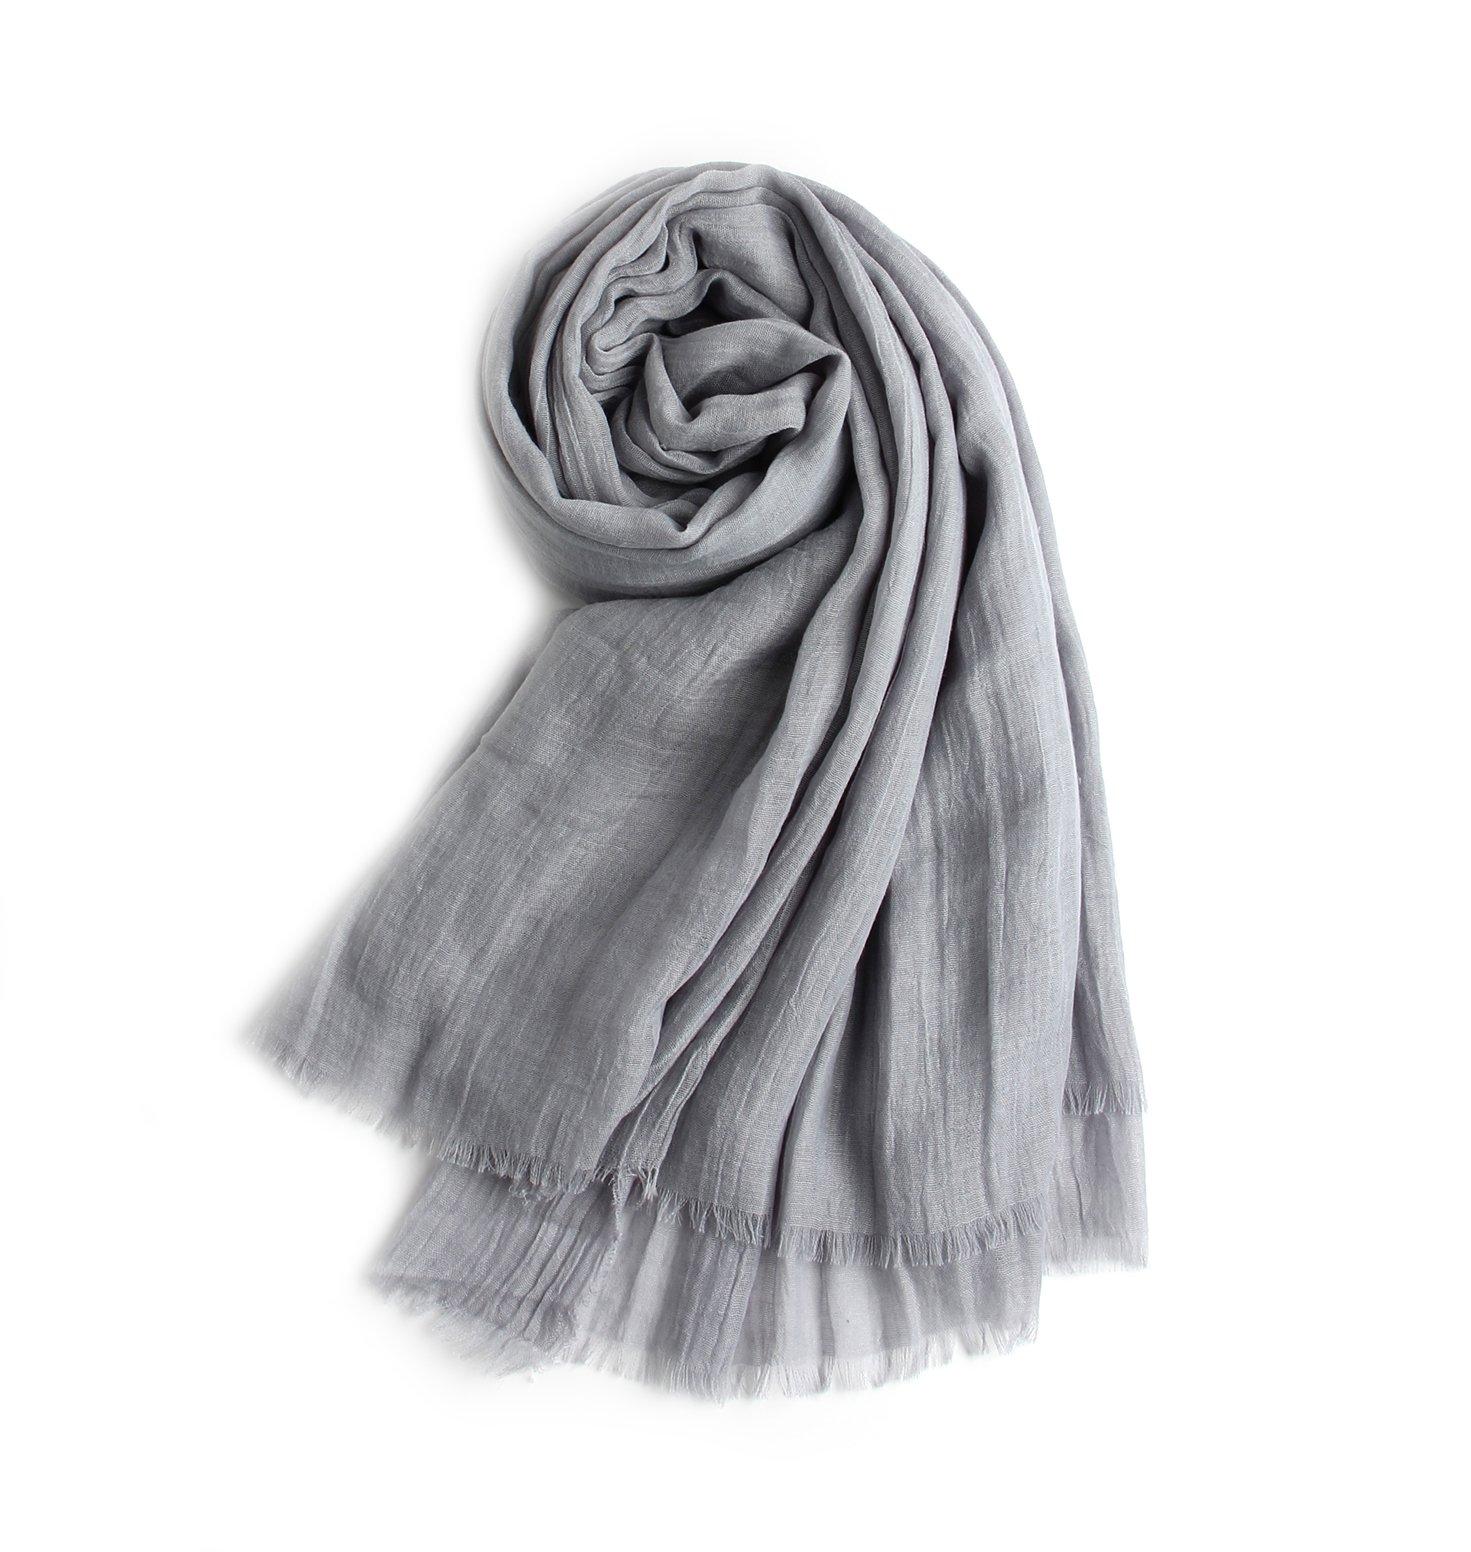 MolVee Linen Warm Scarf Shawl Women Men Solid Color Wrap Beach Towel (046-Light Grey)